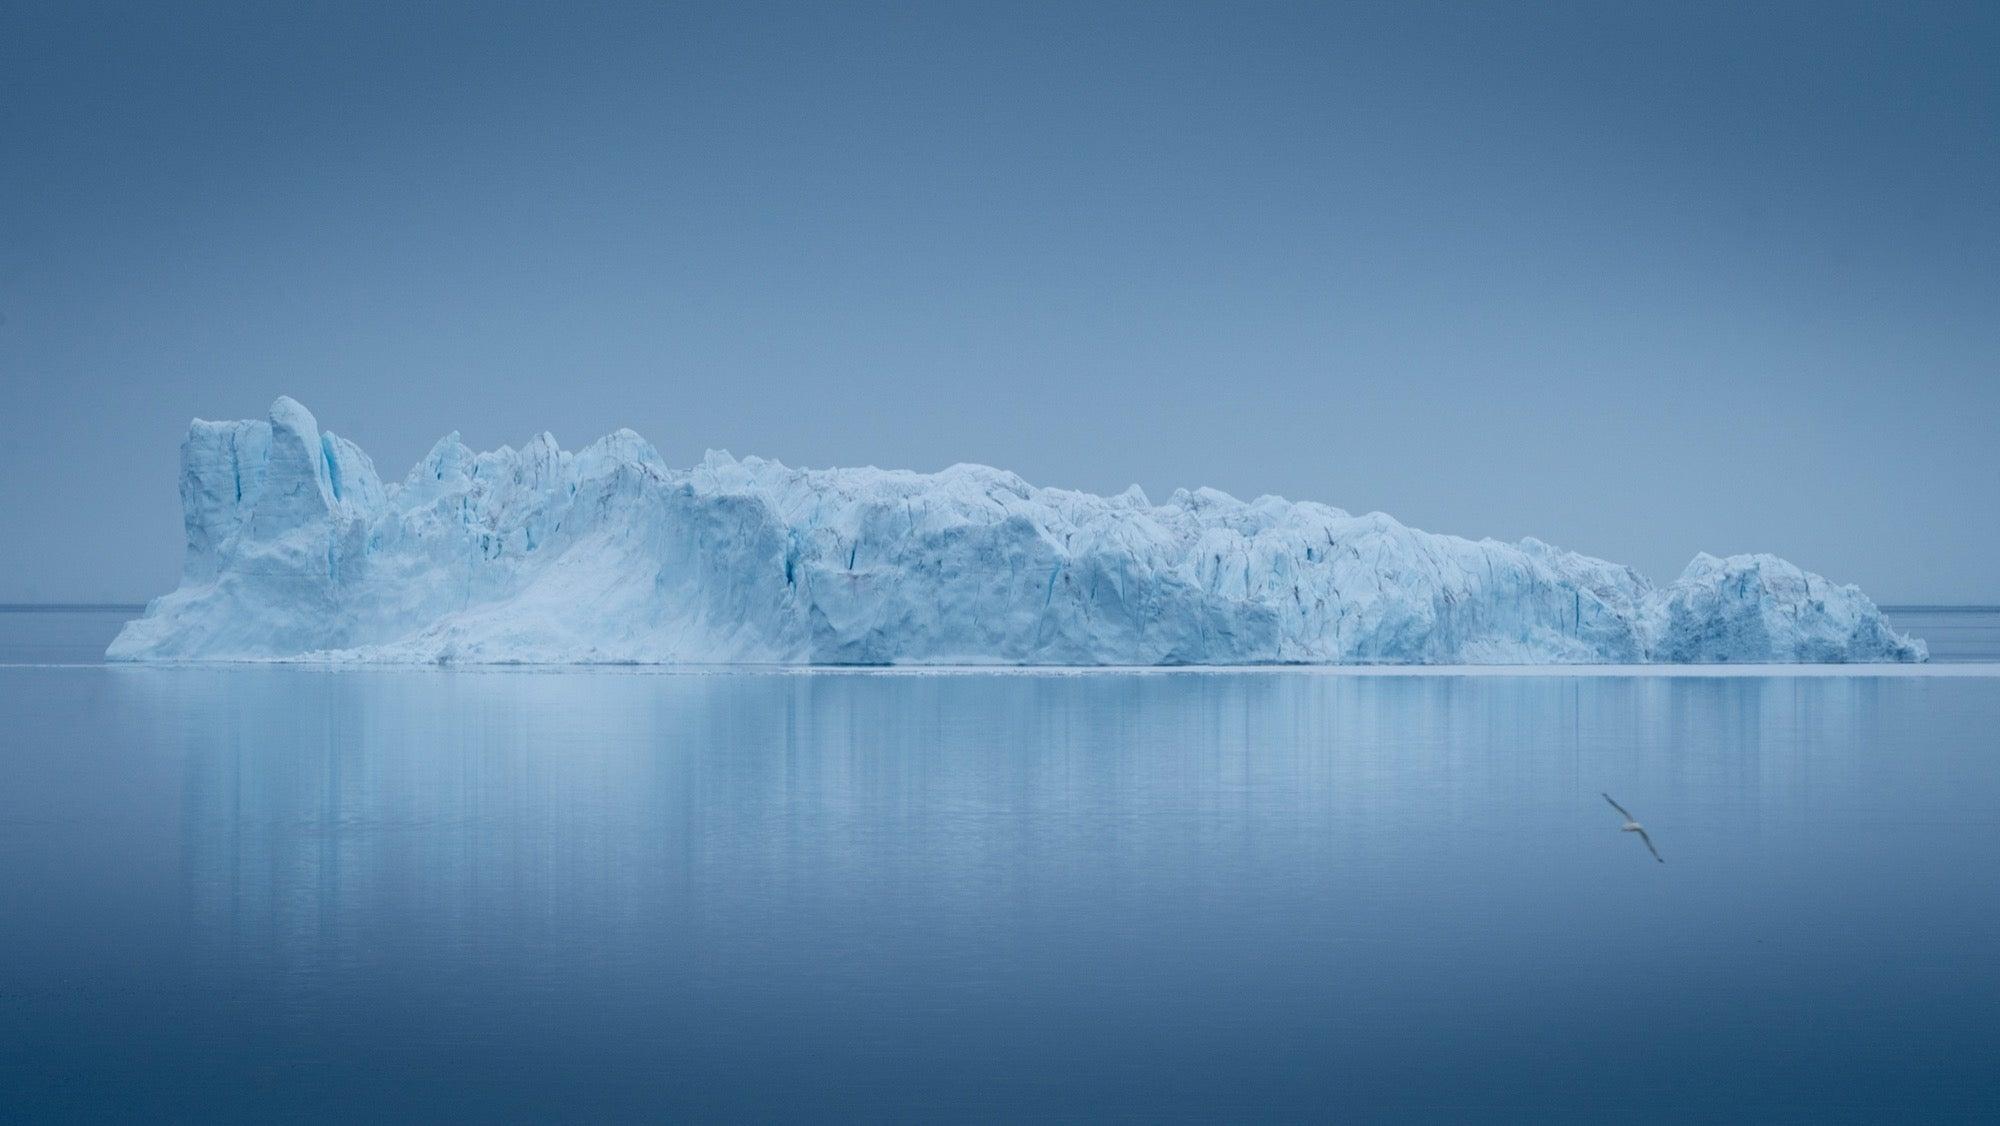 Alpha-Universe-Photo-by-David-McLain-Greenland-12694.By6N43u1L.jpg